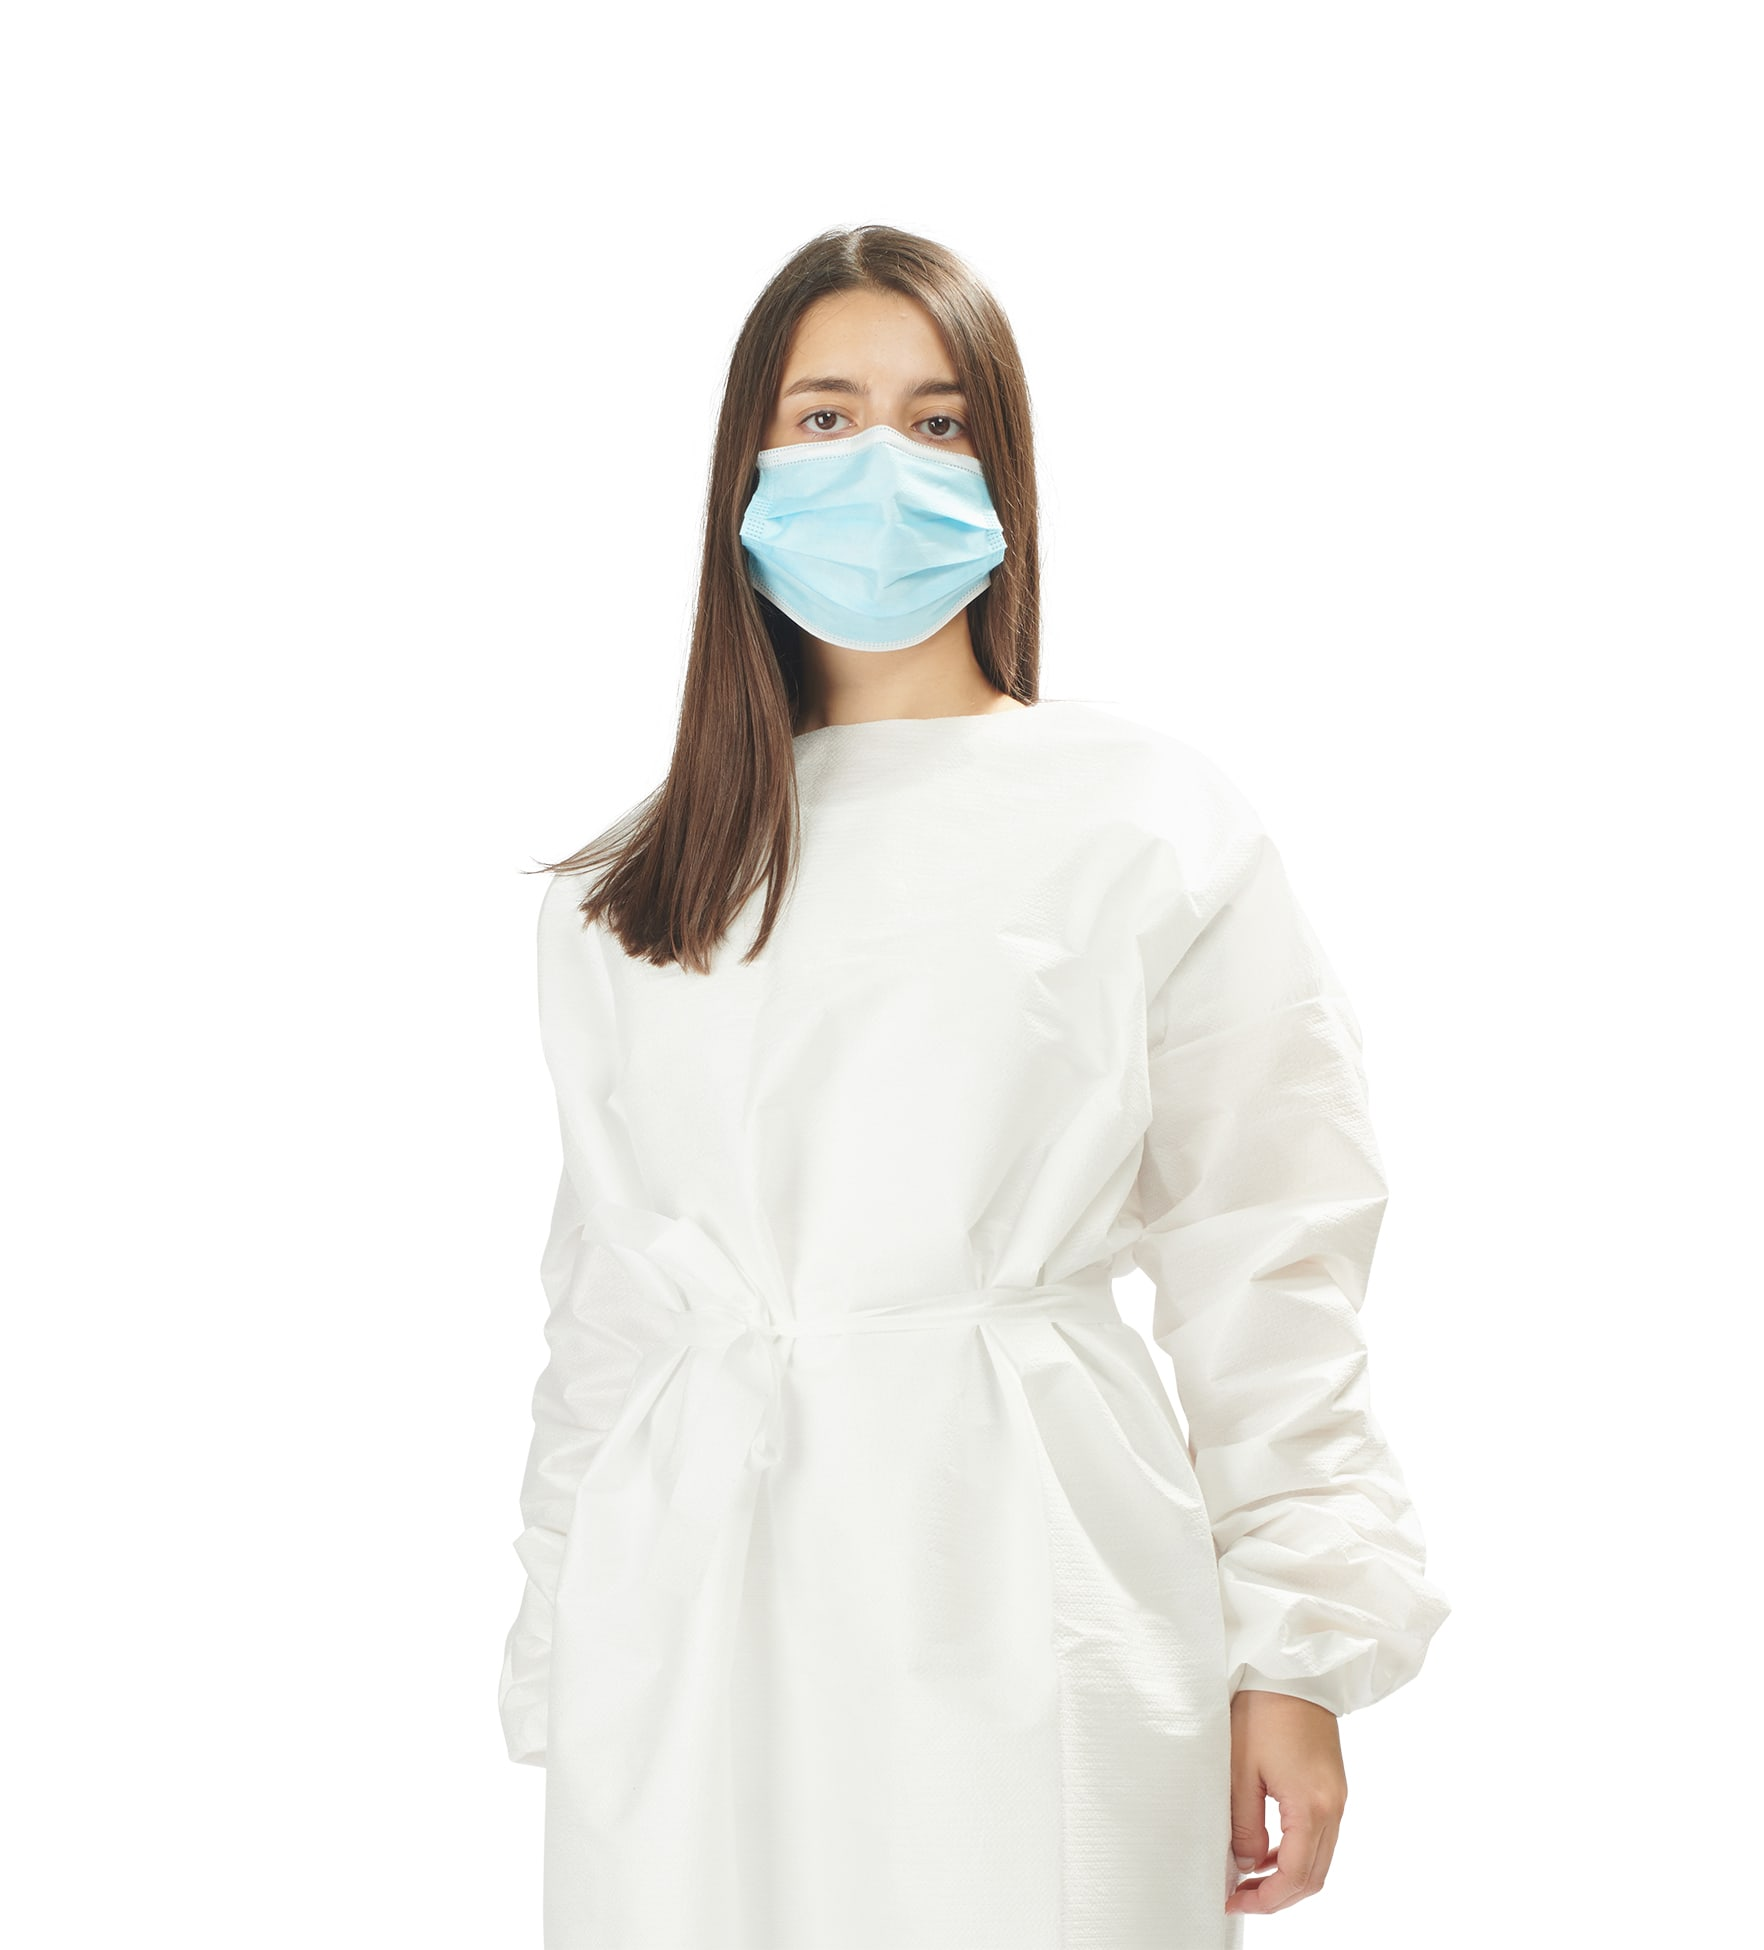 batas impermeáveis 4 - waterproof gowns - clothe protect